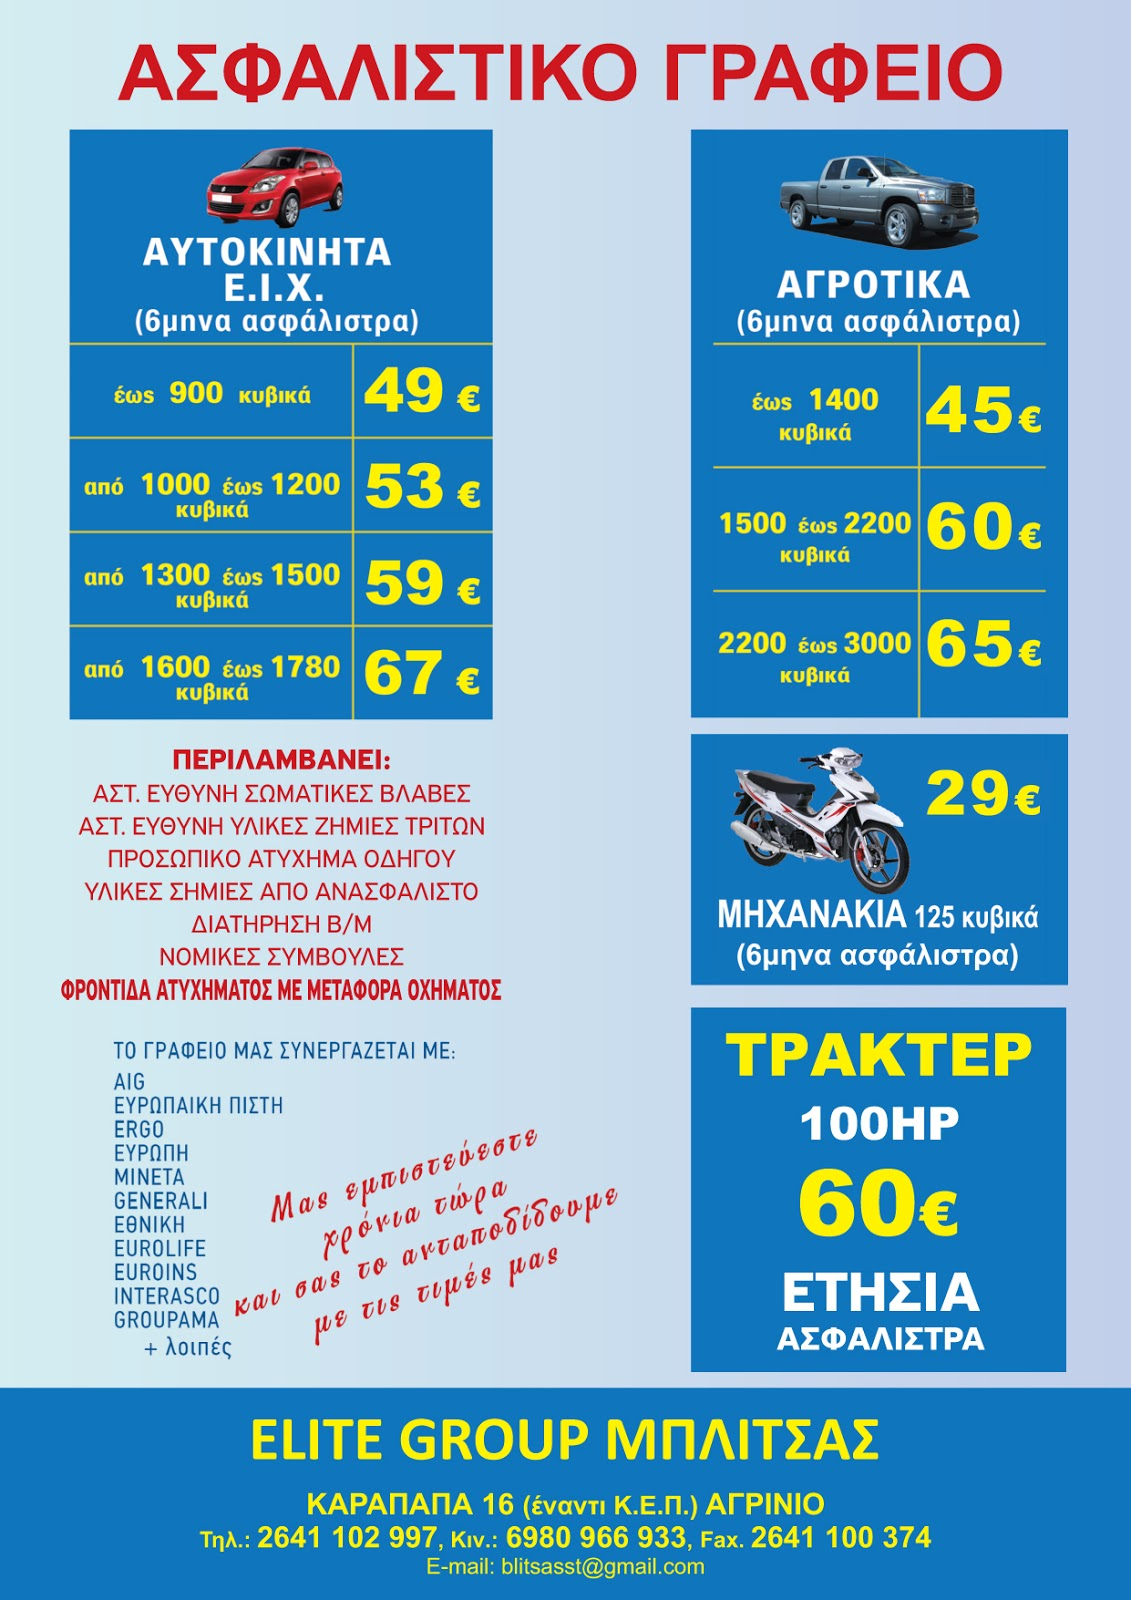 0208103d79 Οι φθηνότερες ασφάλειες οχημάτων στην Αιτωλοακαρνανία